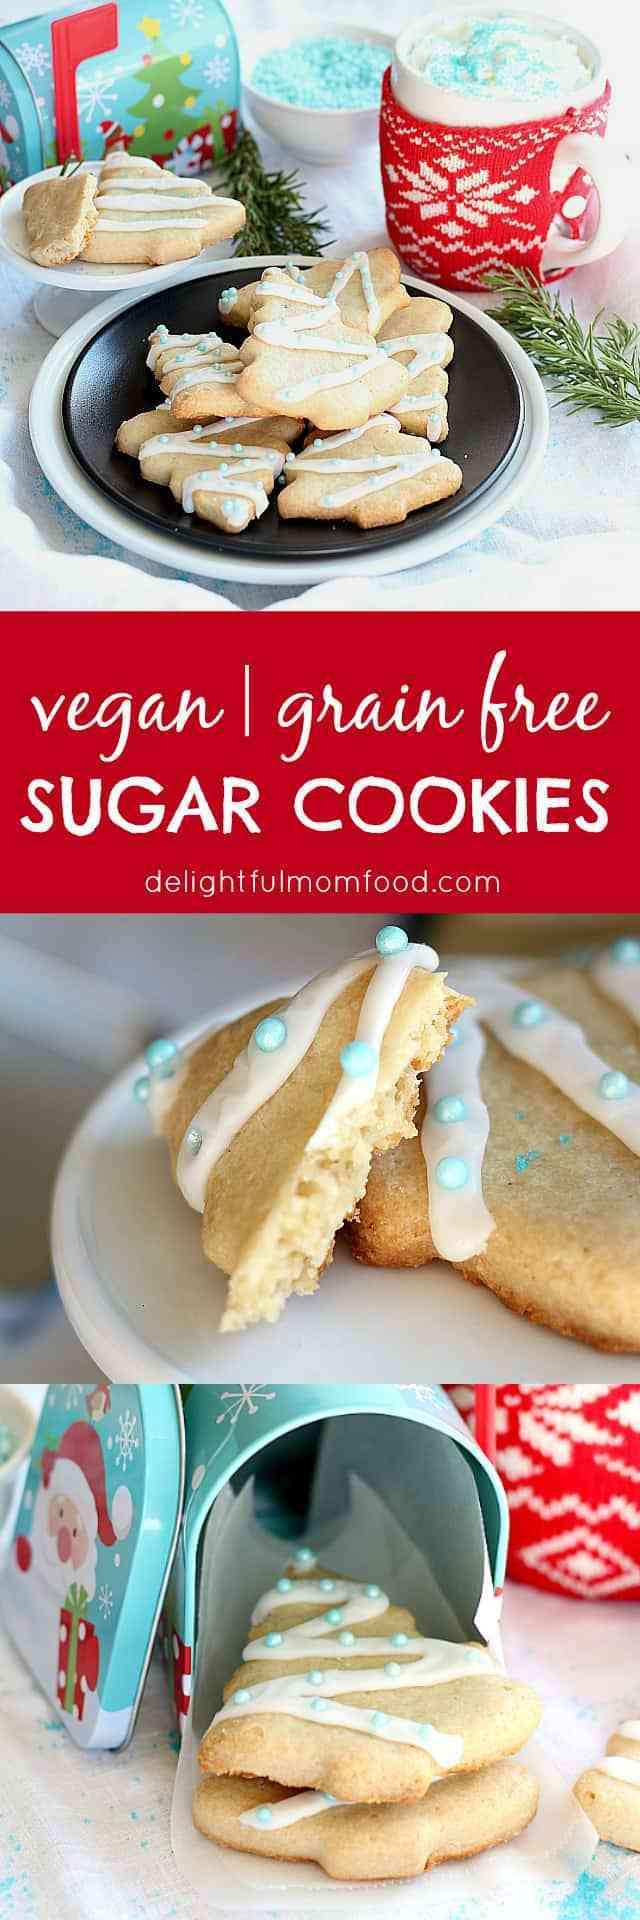 Vegan Christmas Sugar Cookies  Vegan Sugar Cookies Grain Free Gluten Free